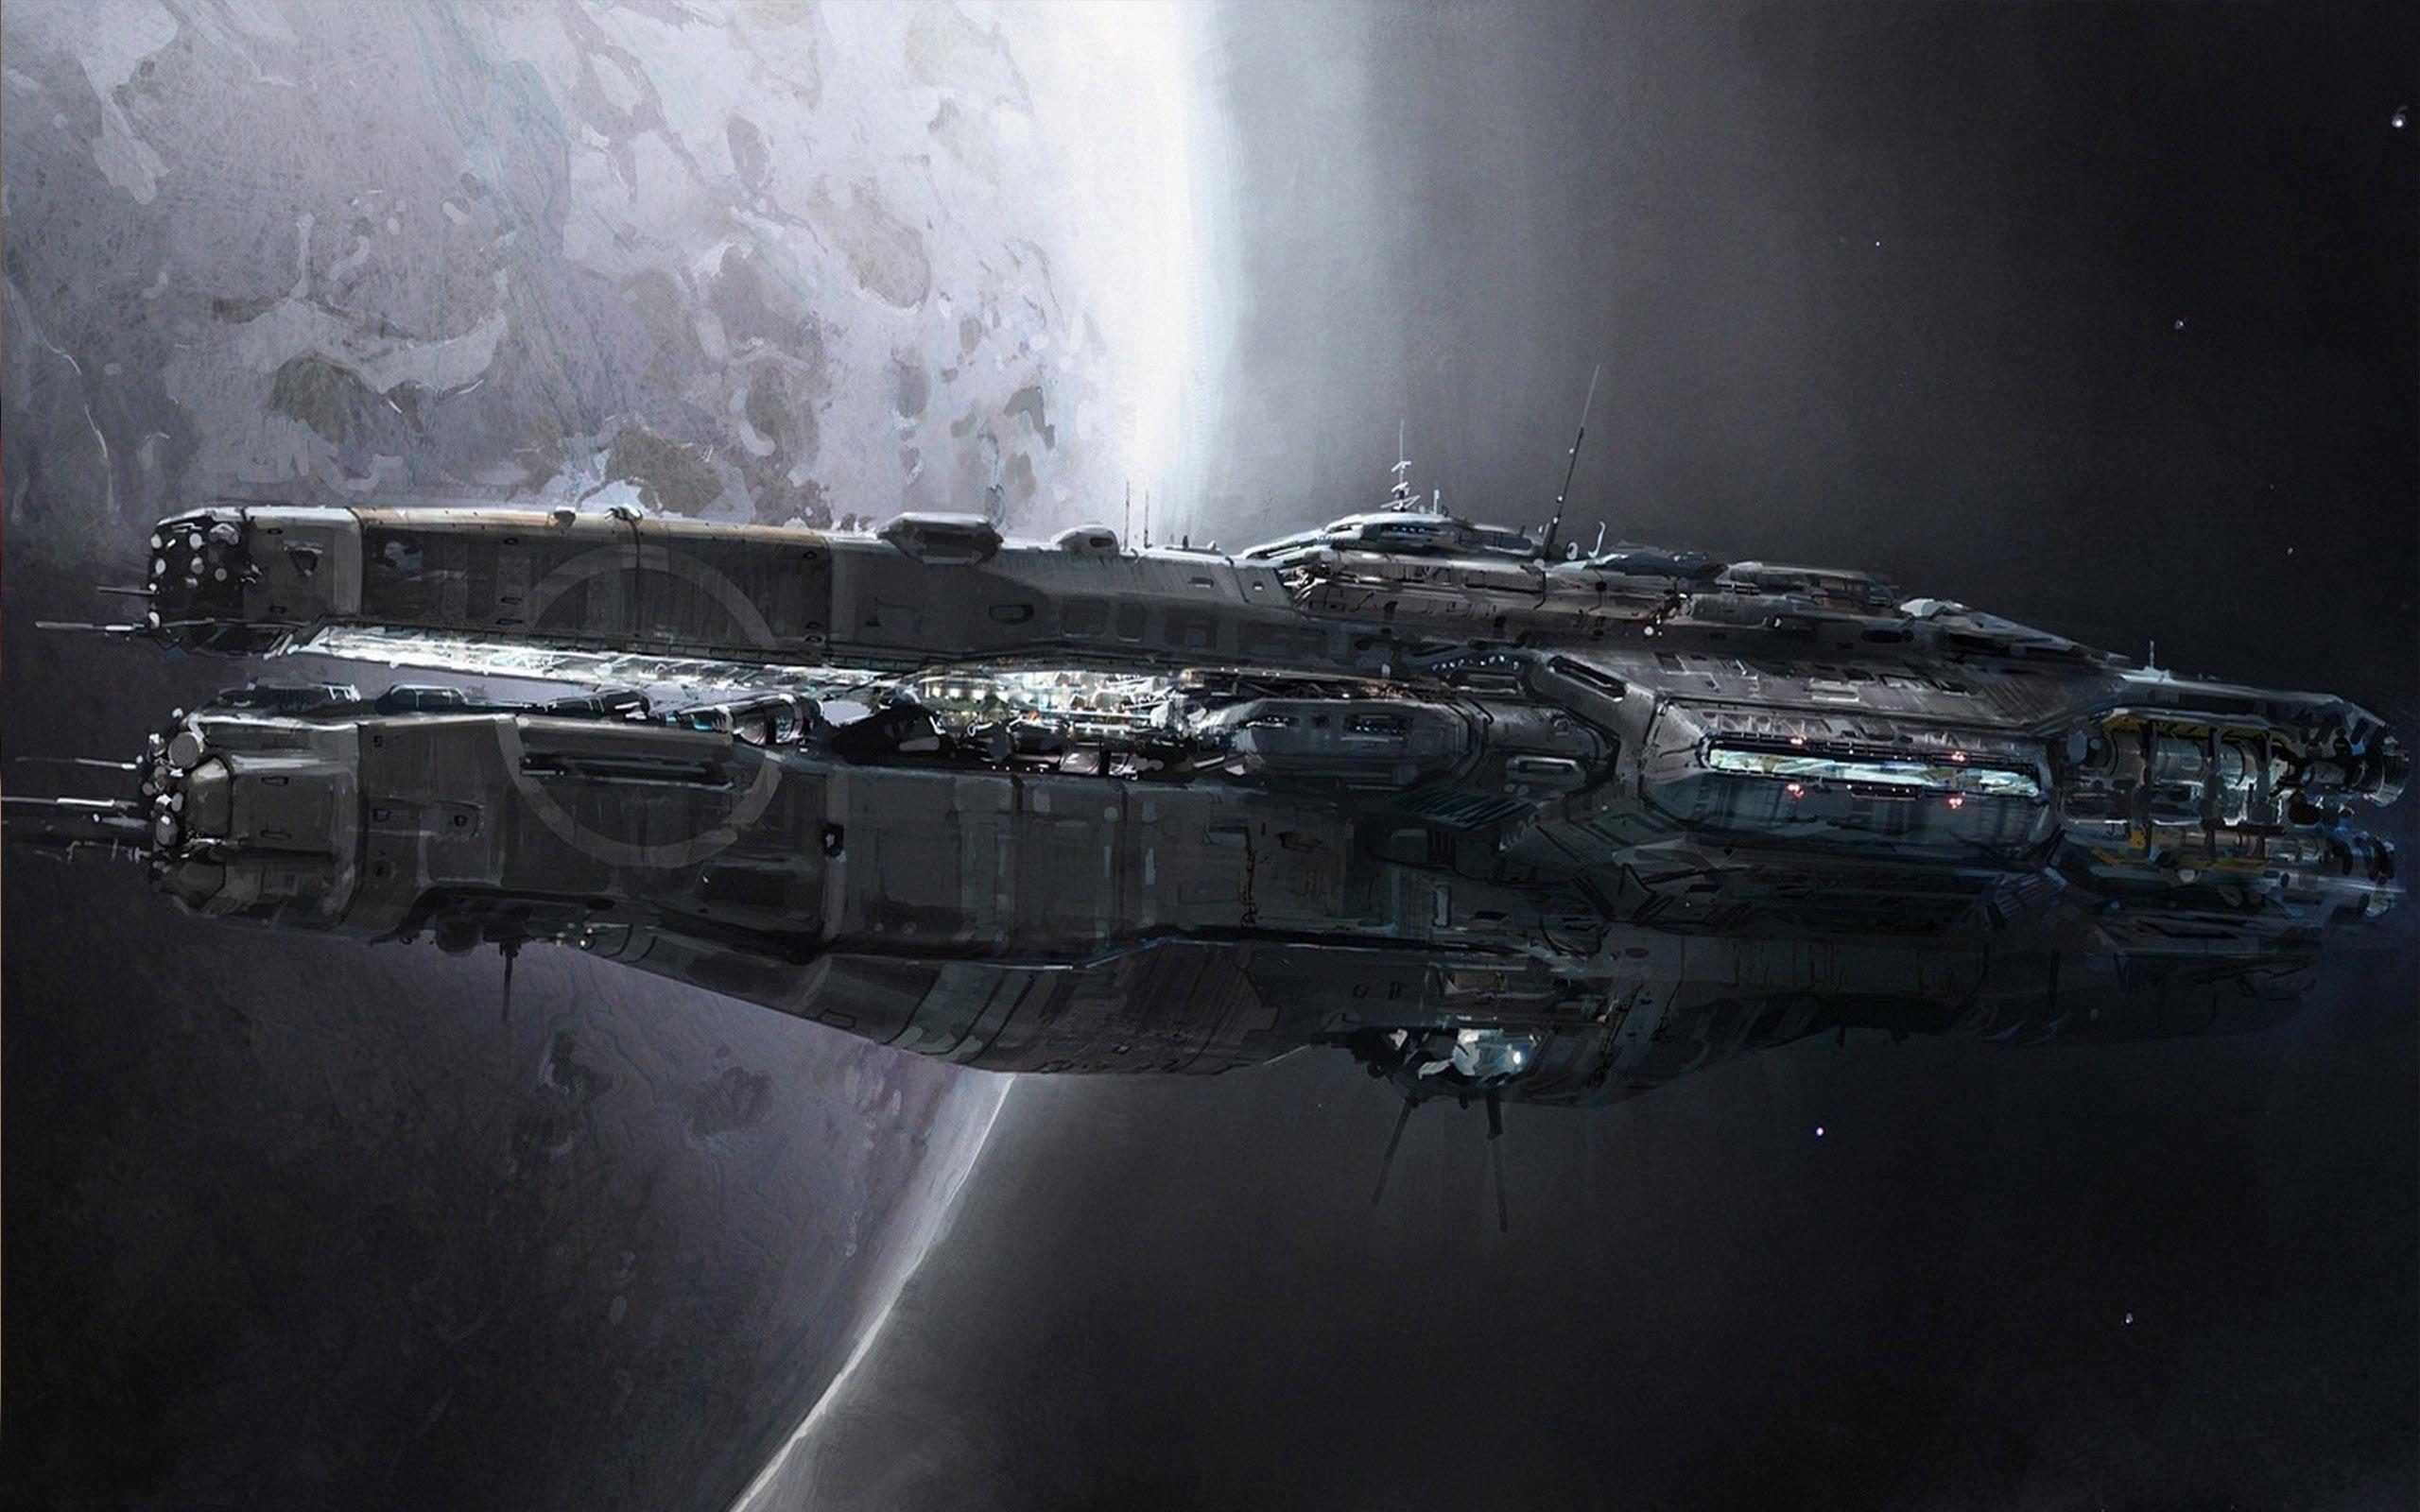 Spaceship wallpaper 14704 2560x1600